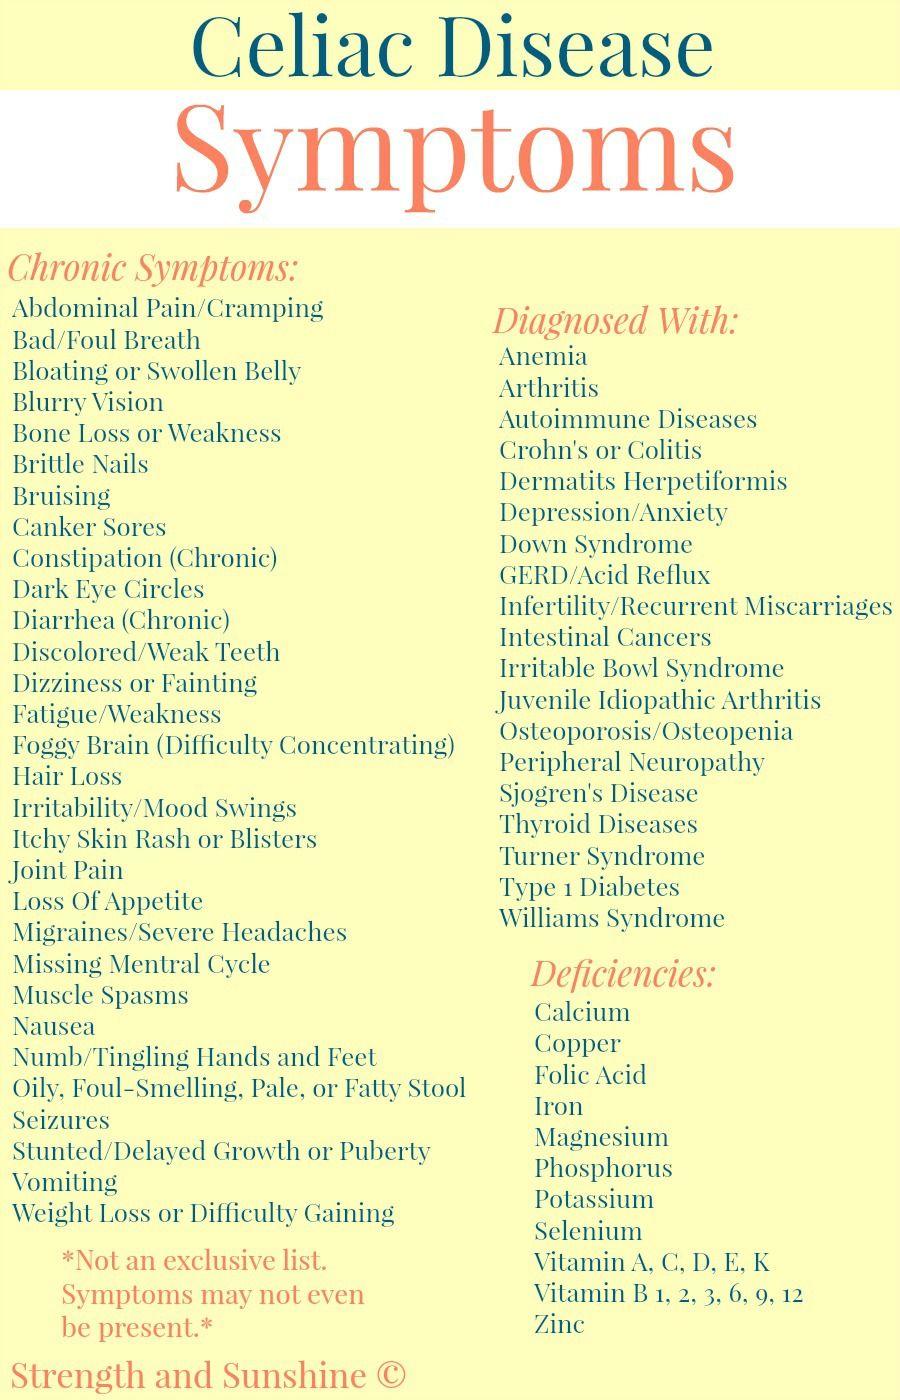 The Signs & Symptoms of Celiac Disease | Celiac symptoms ...